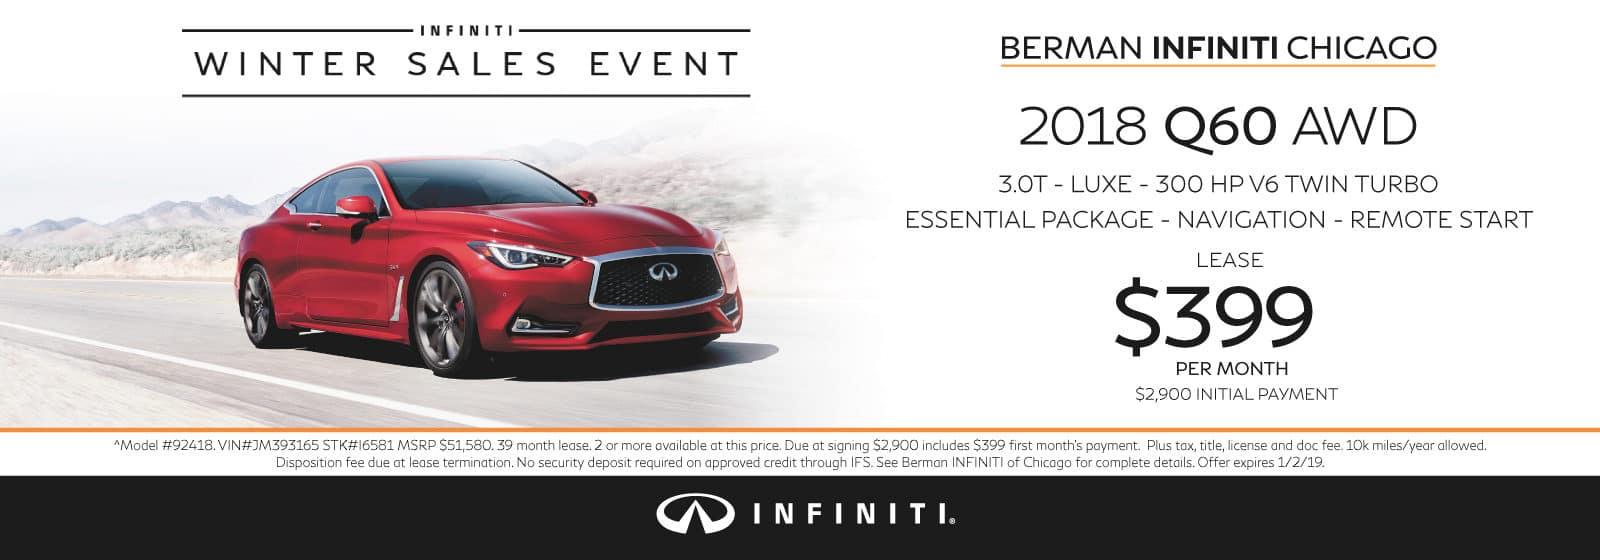 New 2018 INFINITI Q60 December offer at Berman INFINITI Chicago!